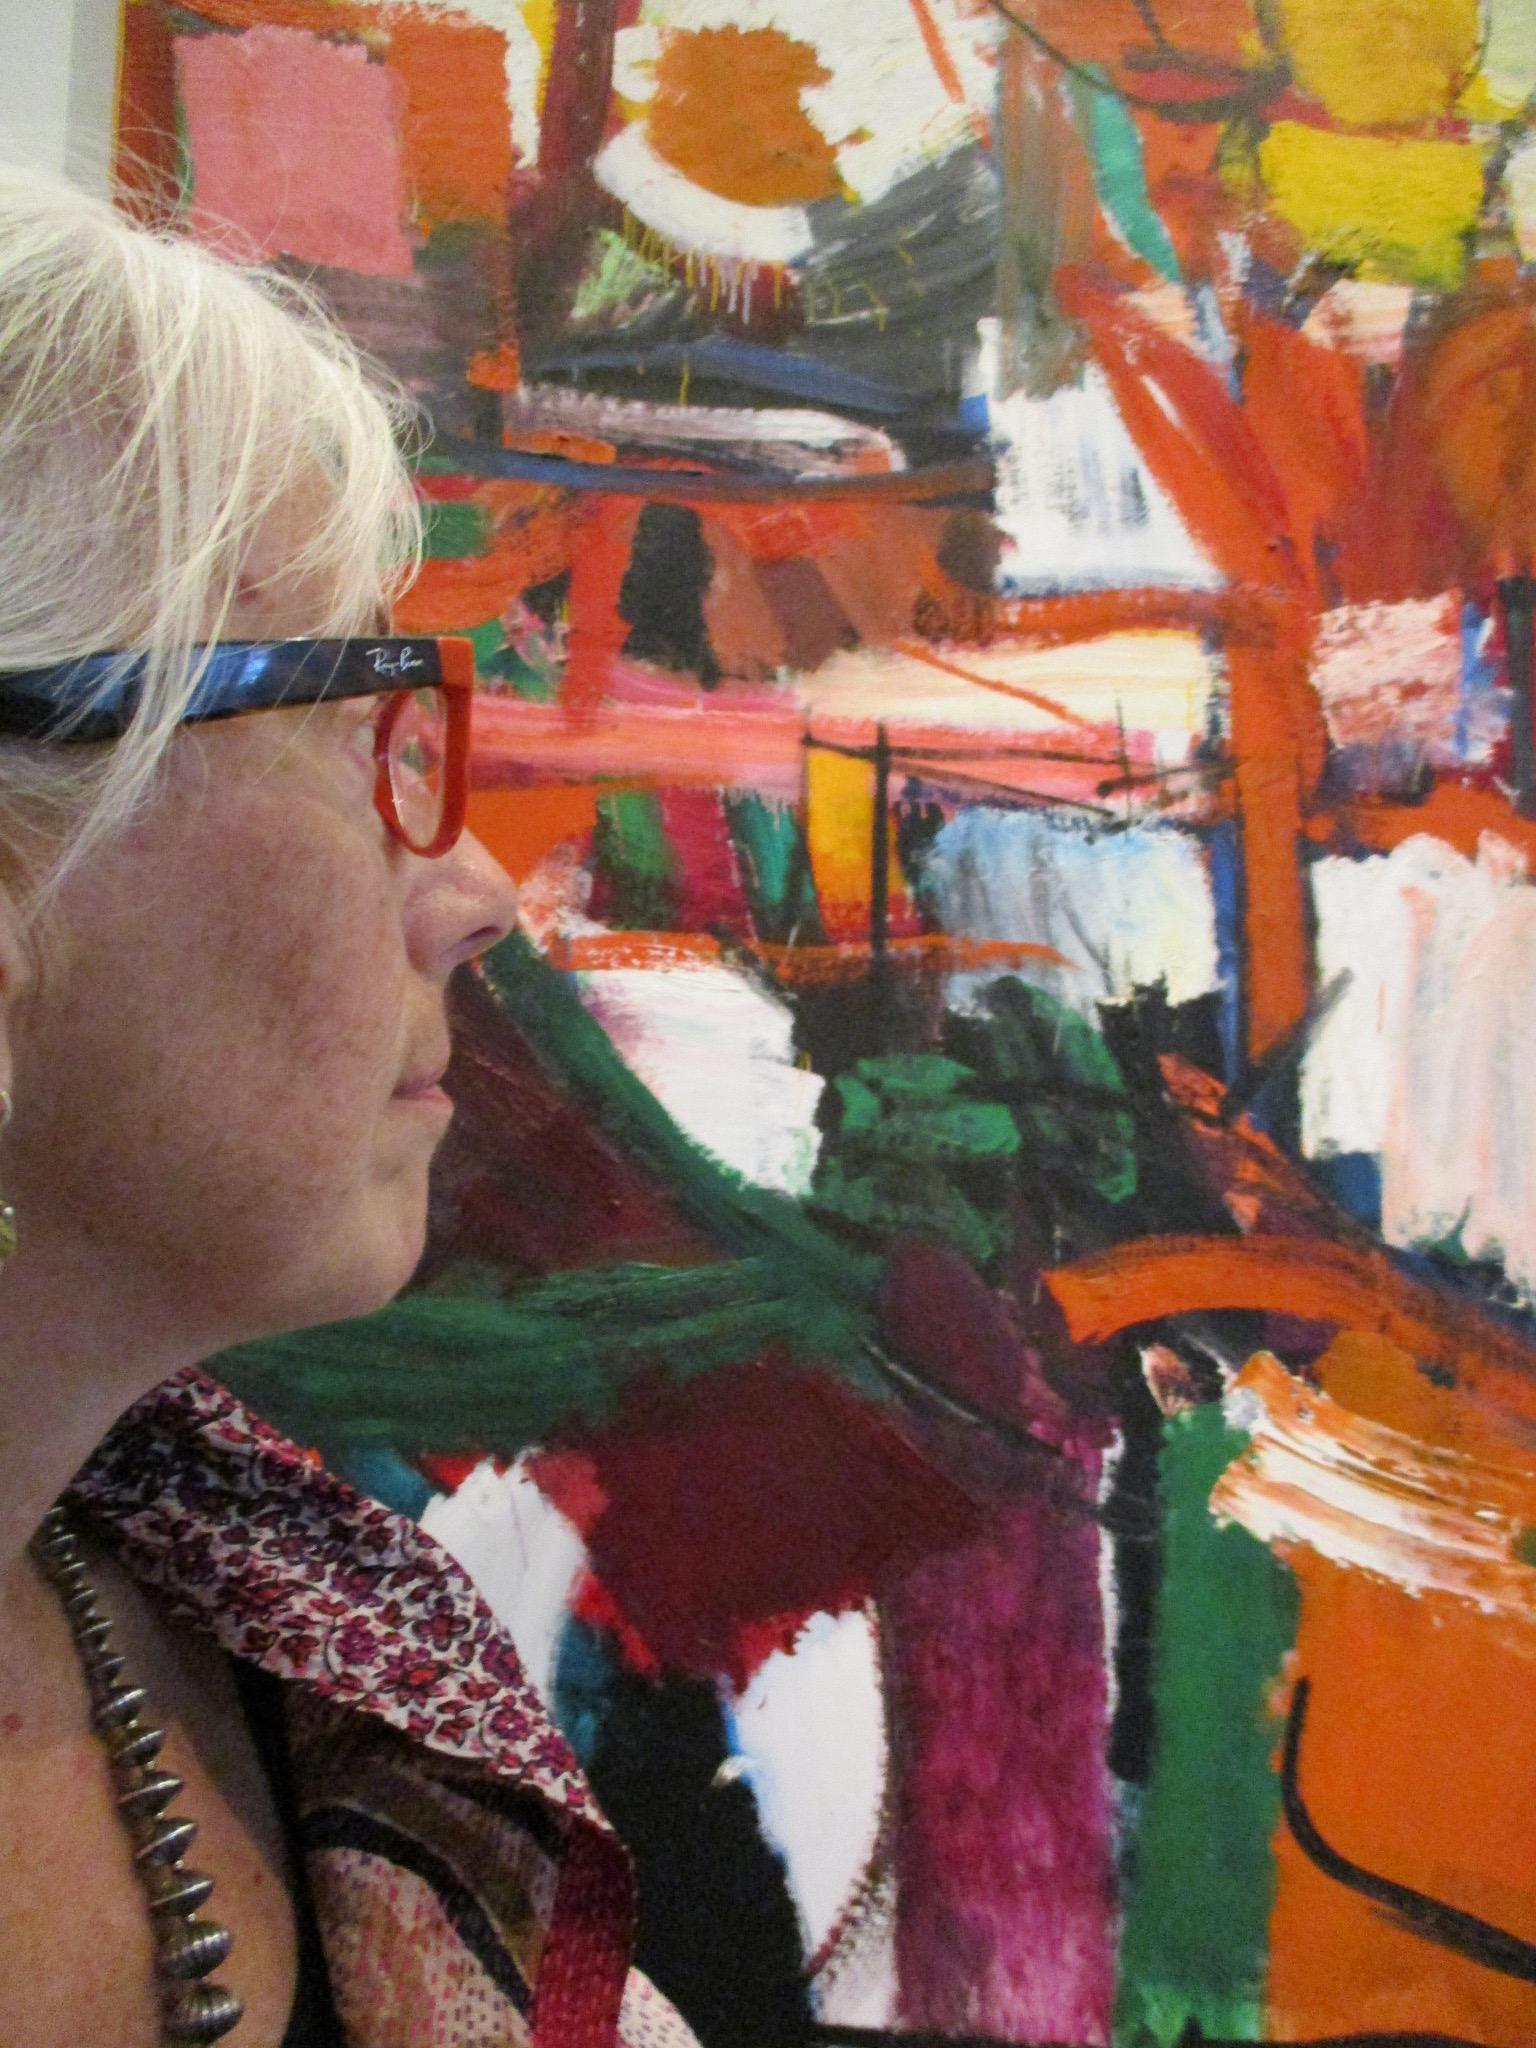 Abstract Expression Workshop Artwools Studio Of Susan L